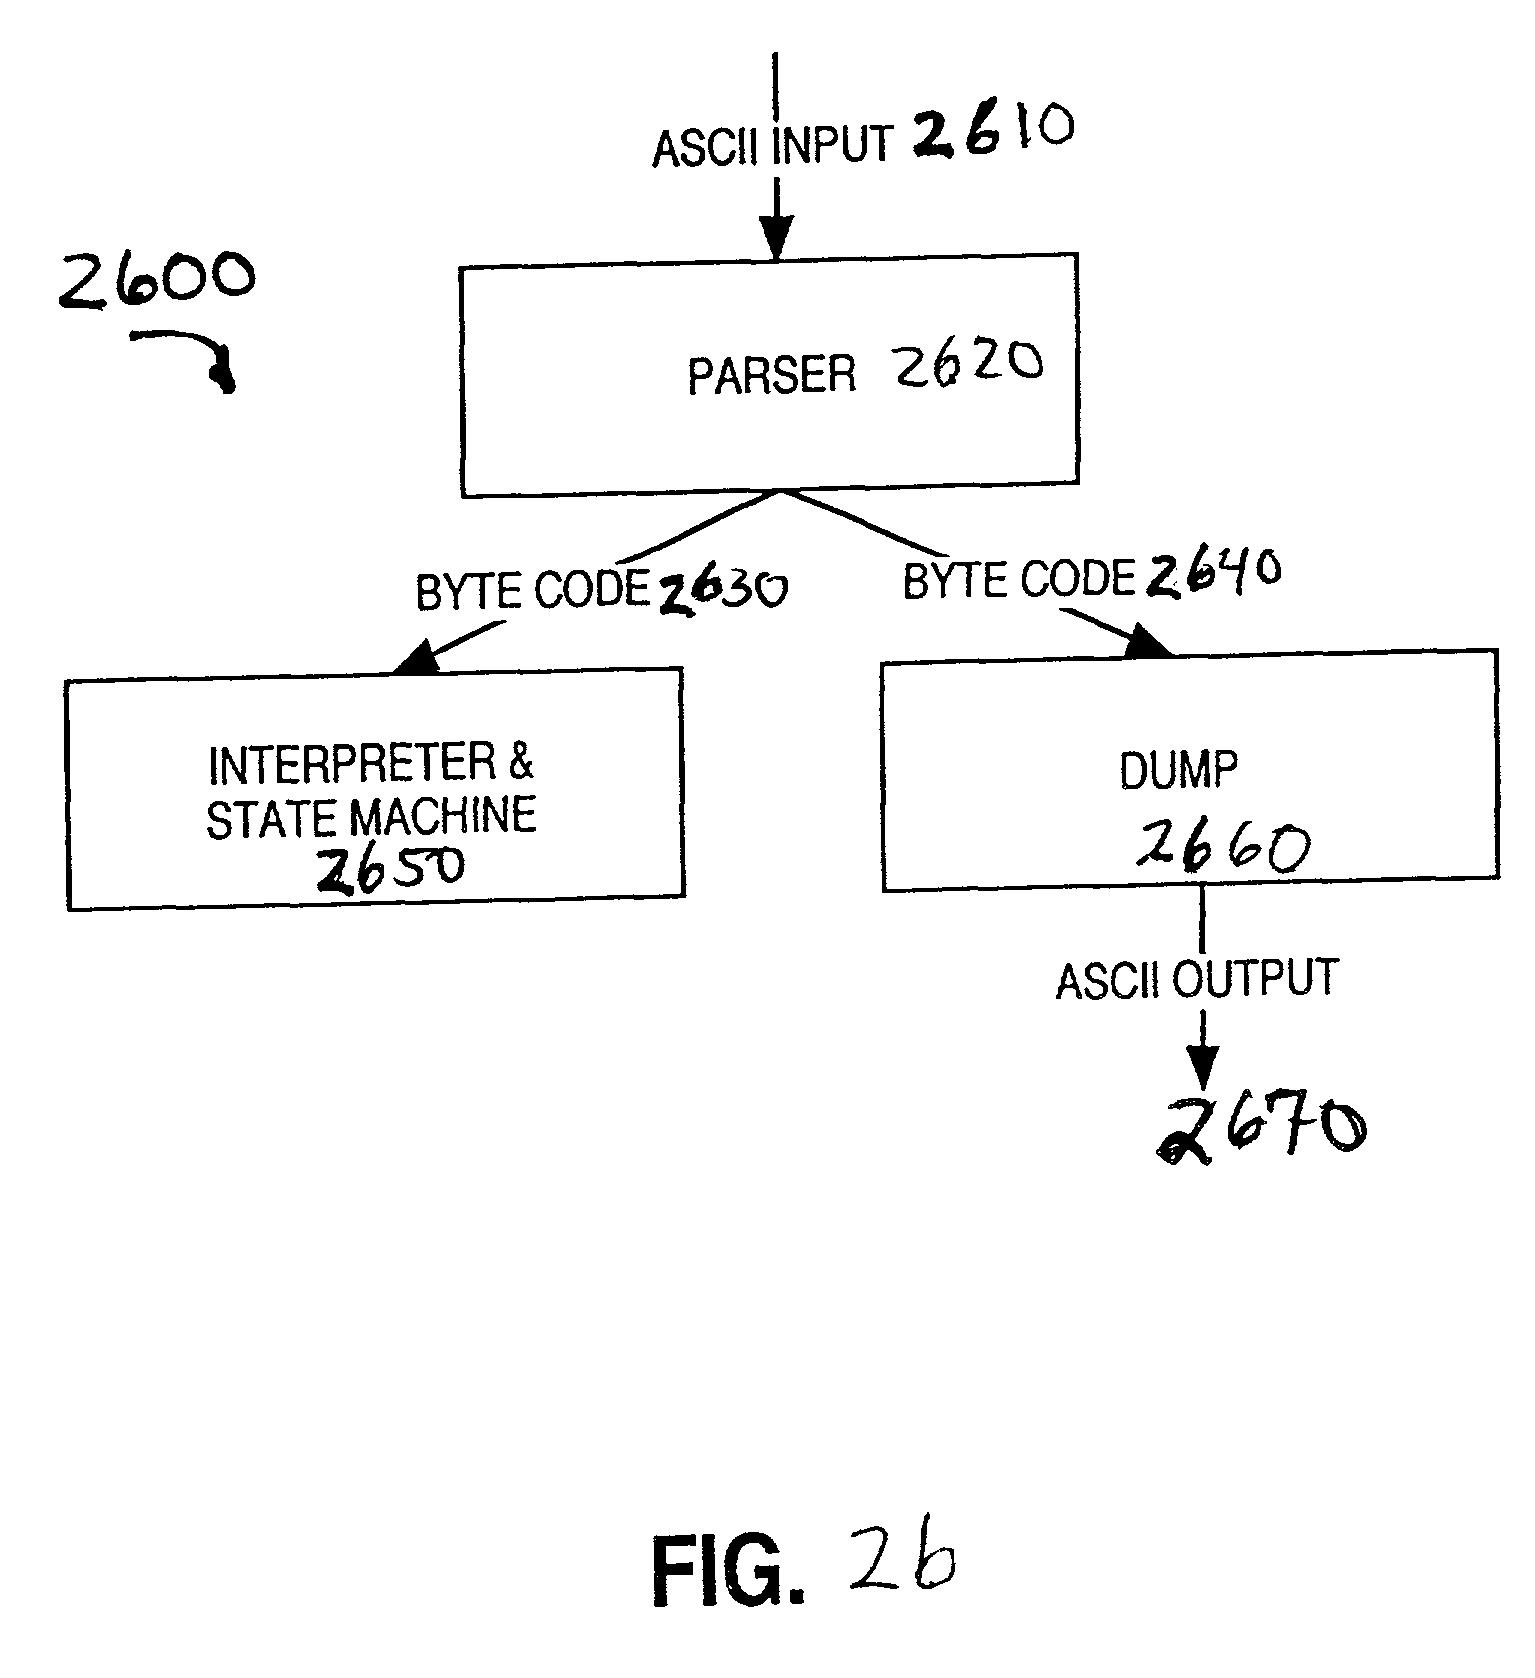 Patent US 7,930,340 B2